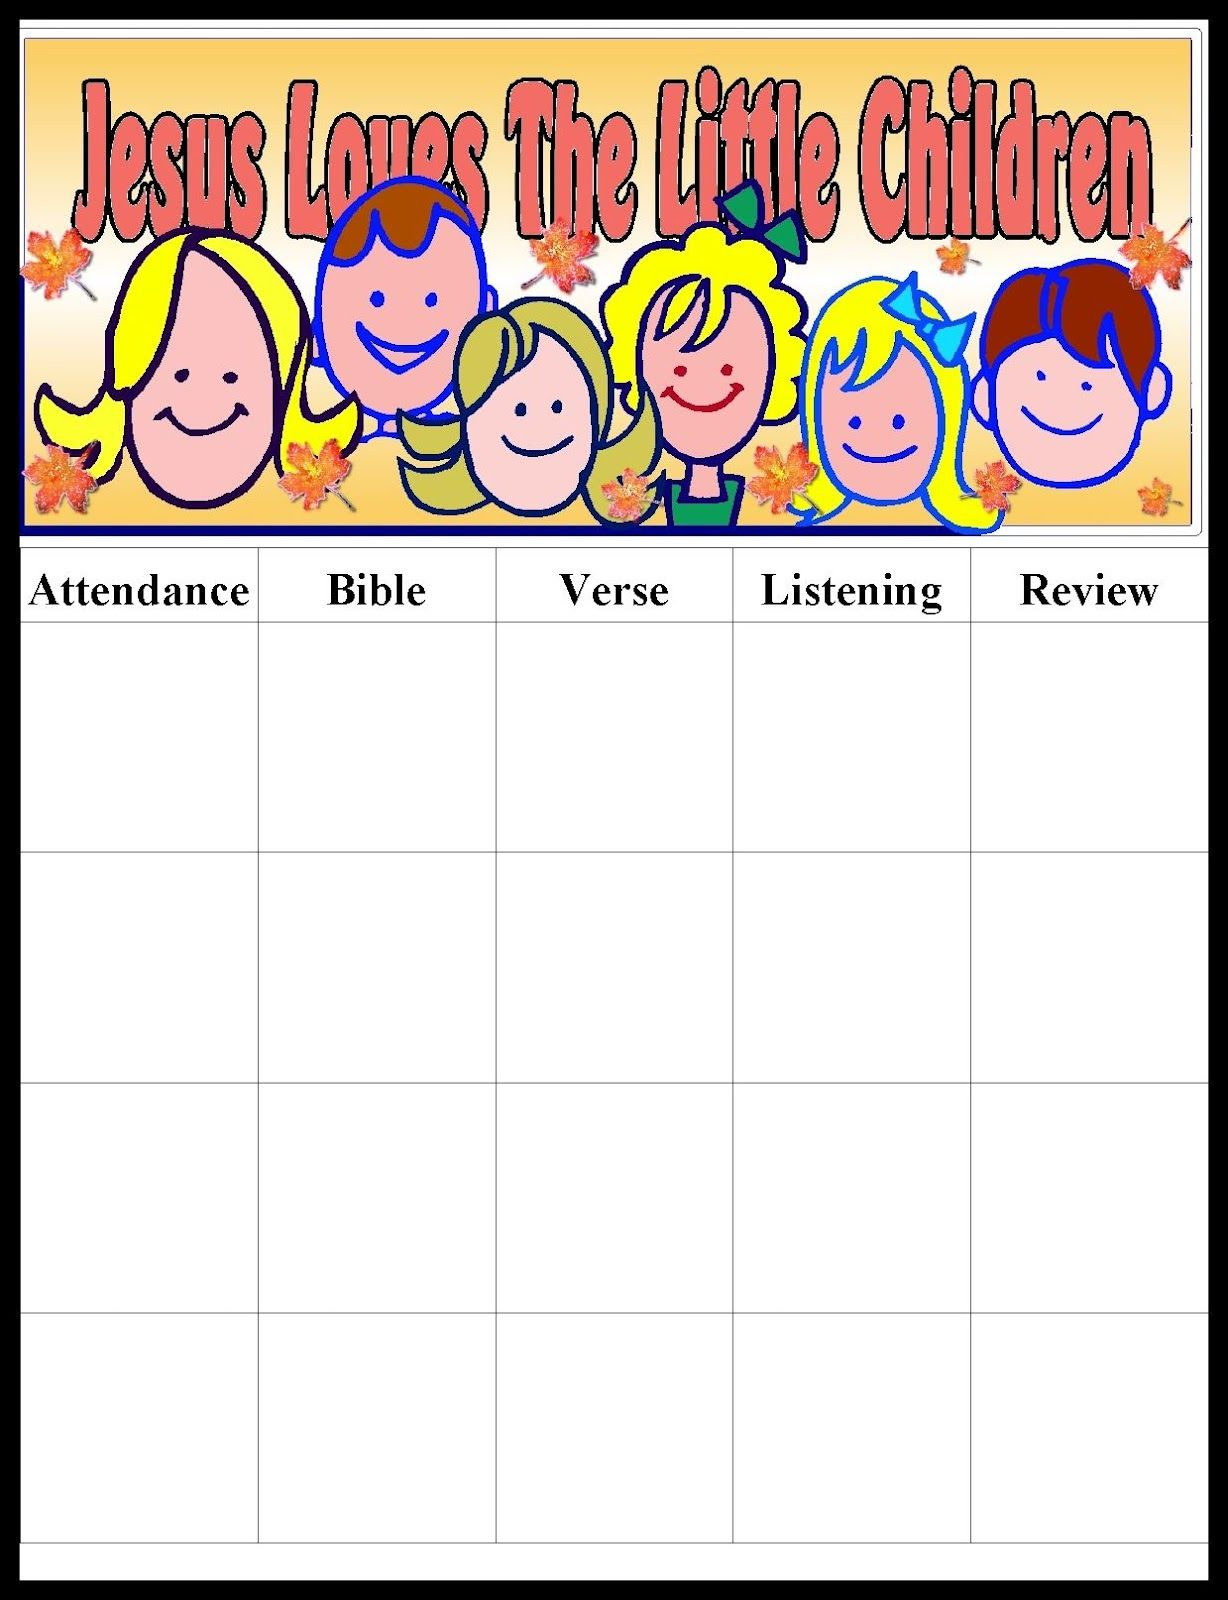 Sunday School Attendance Chart - Google Search | Sunday School - Sunday School Attendance Chart Free Printable